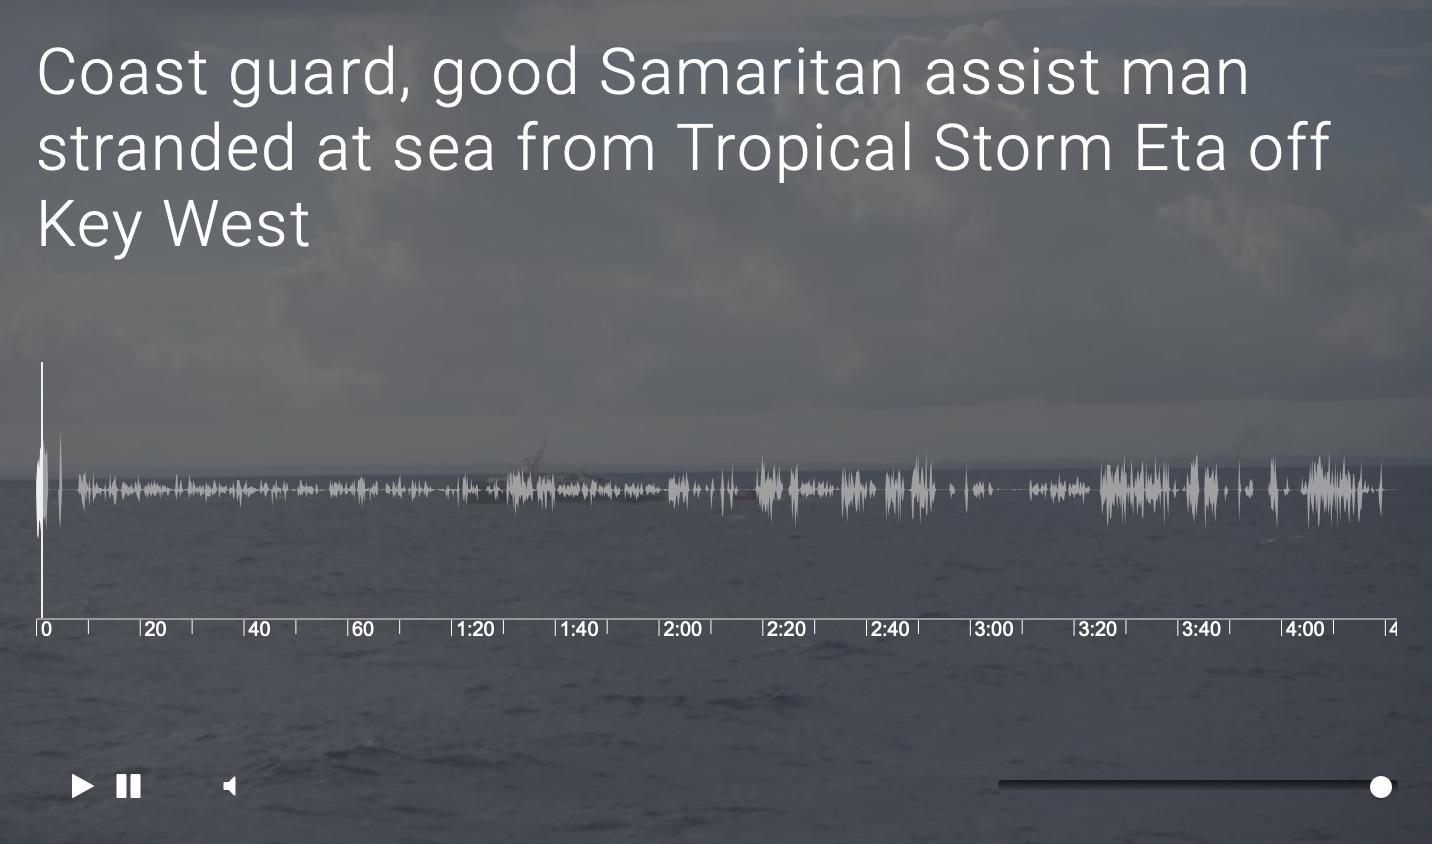 Coast guard, good Samaritan assist man stranded at sea from Tropical Storm Eta off Key West